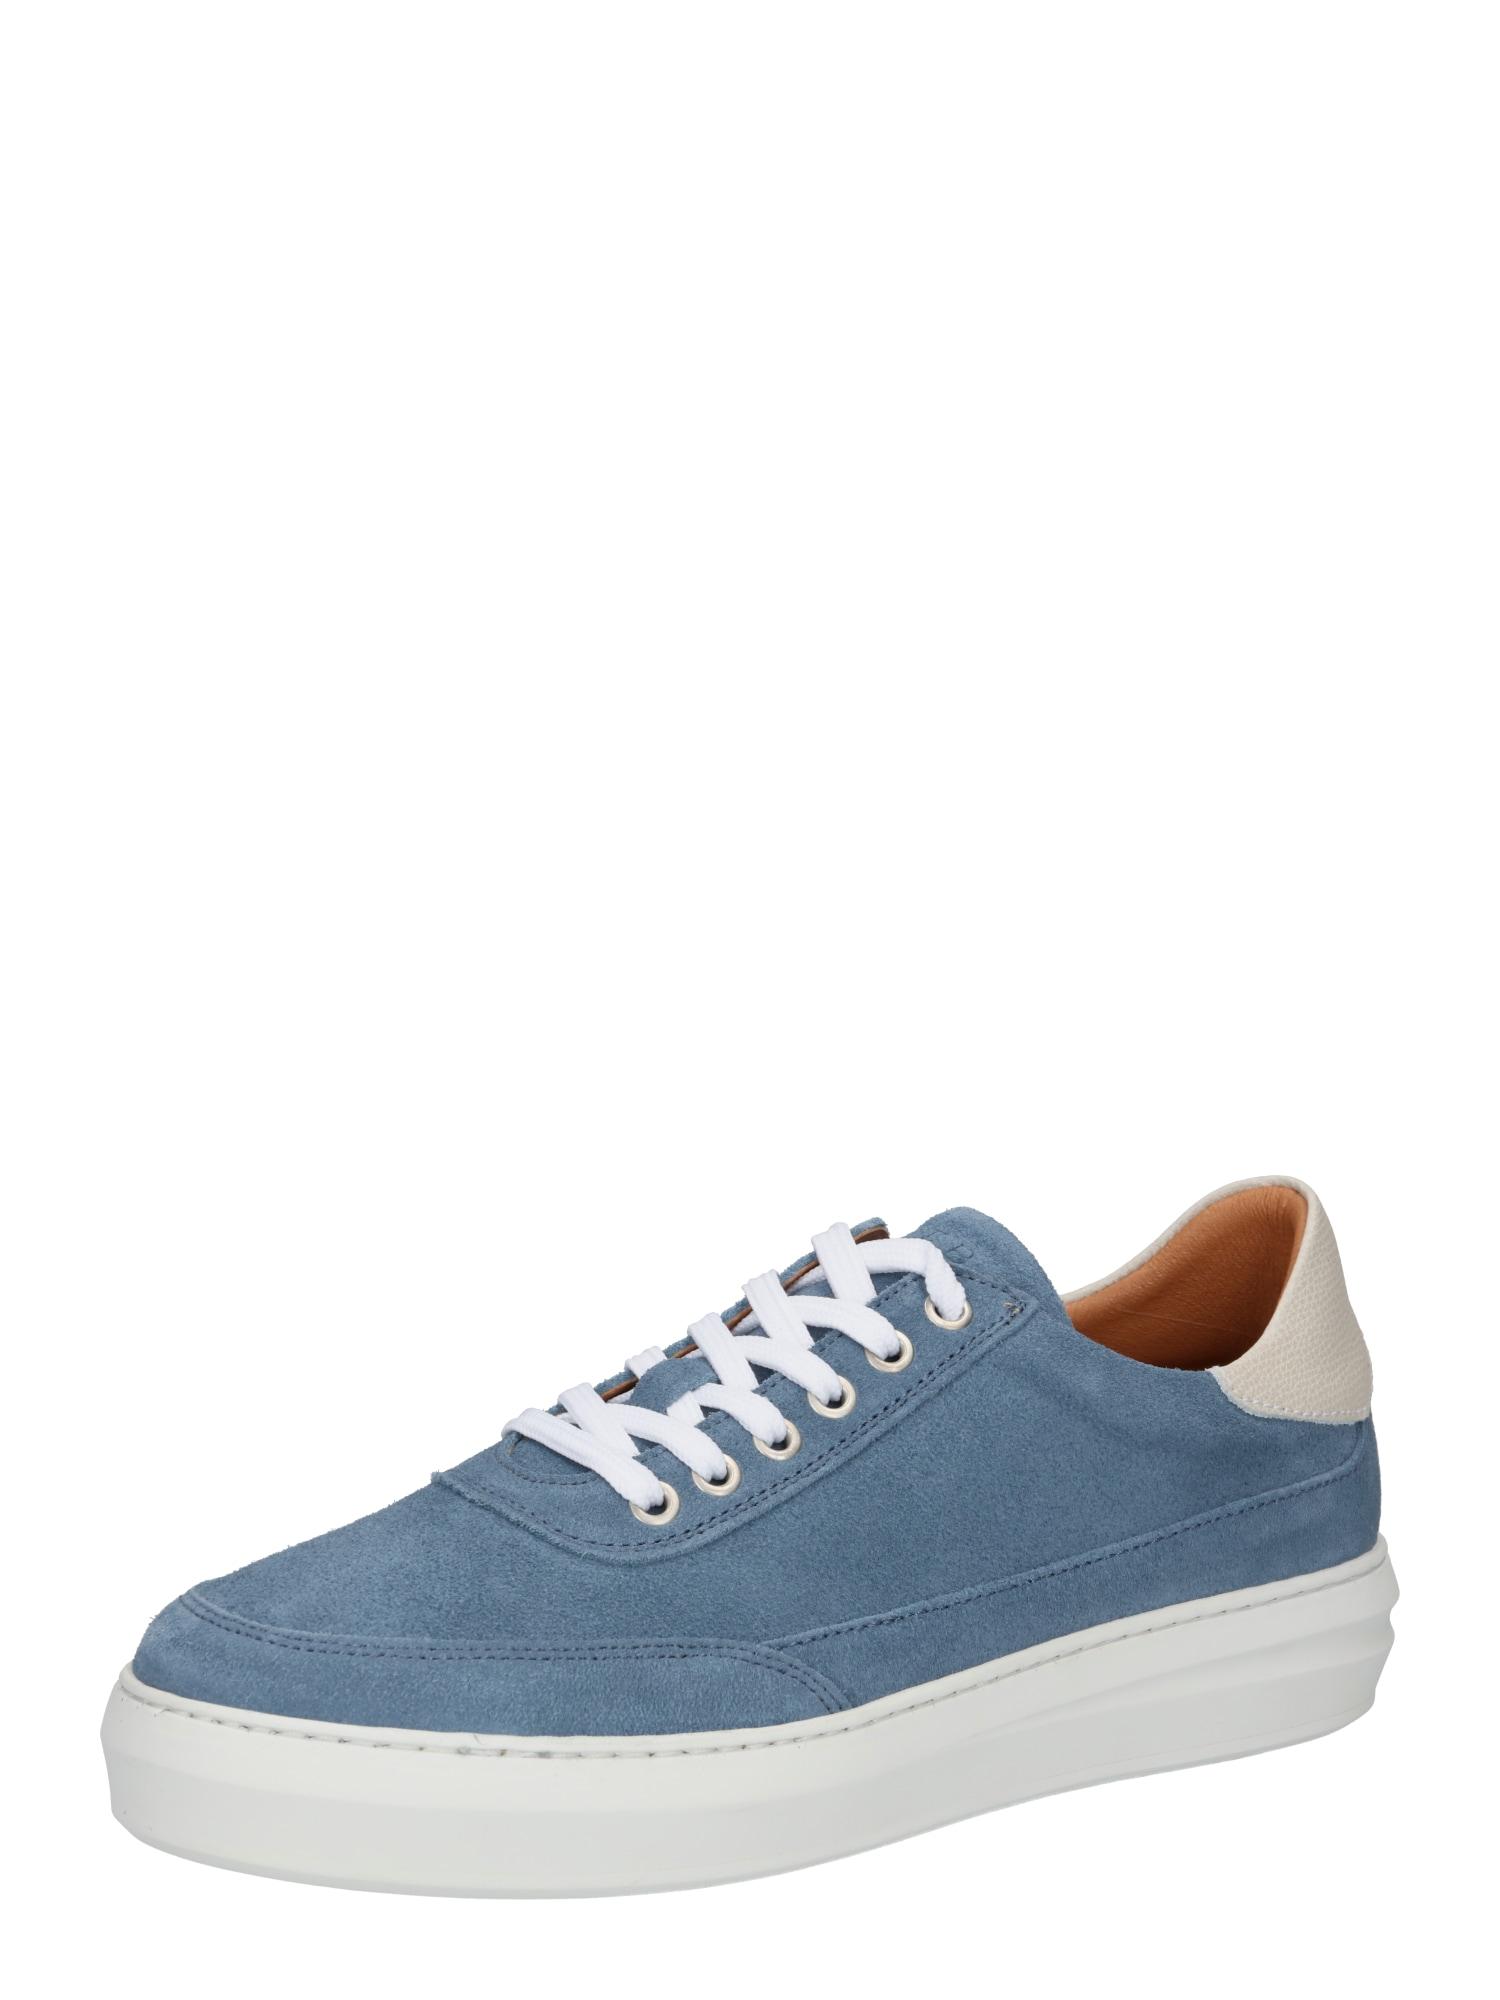 Shoe The Bear Tenisky 'STB-AREN'  chladná modrá / barva bílé vlny